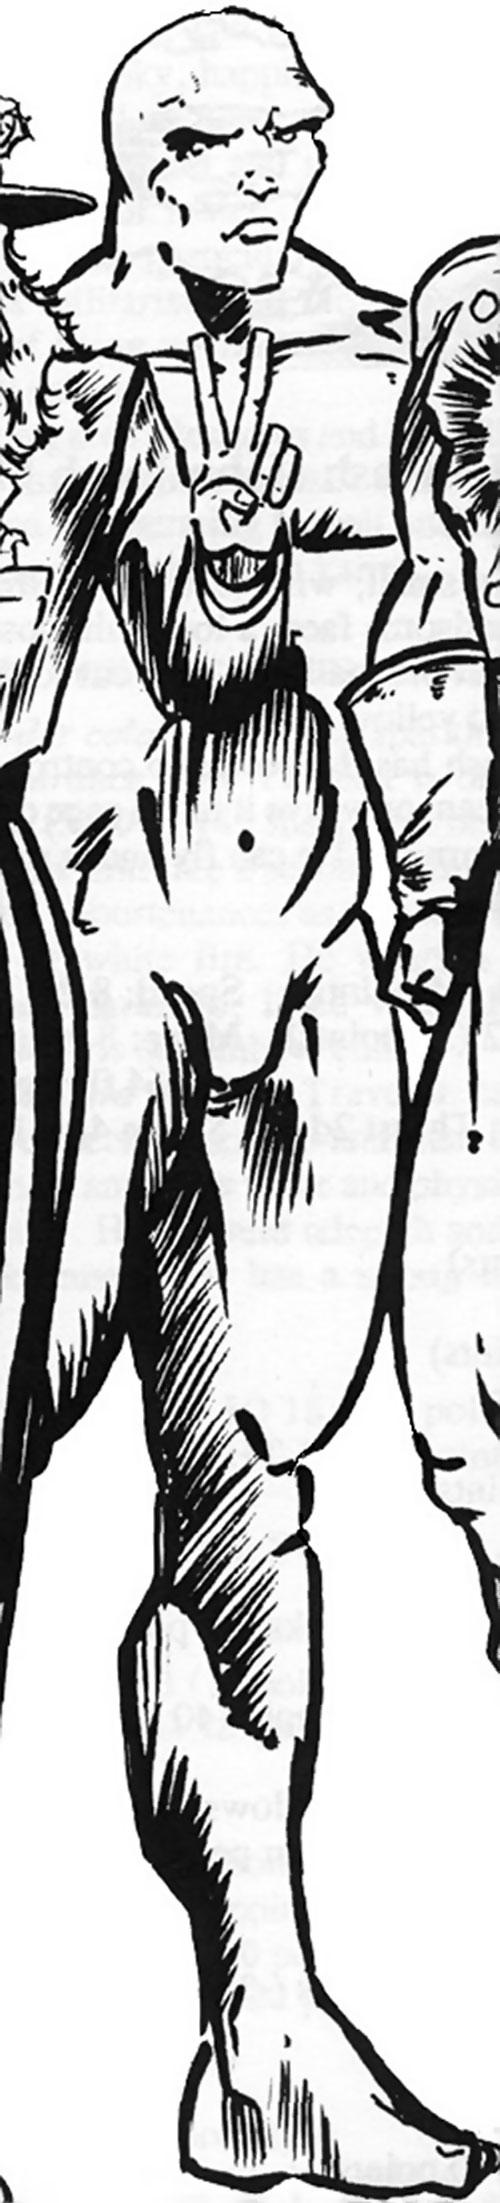 Aquarius form of Captain Trips (Wild Cards novels)